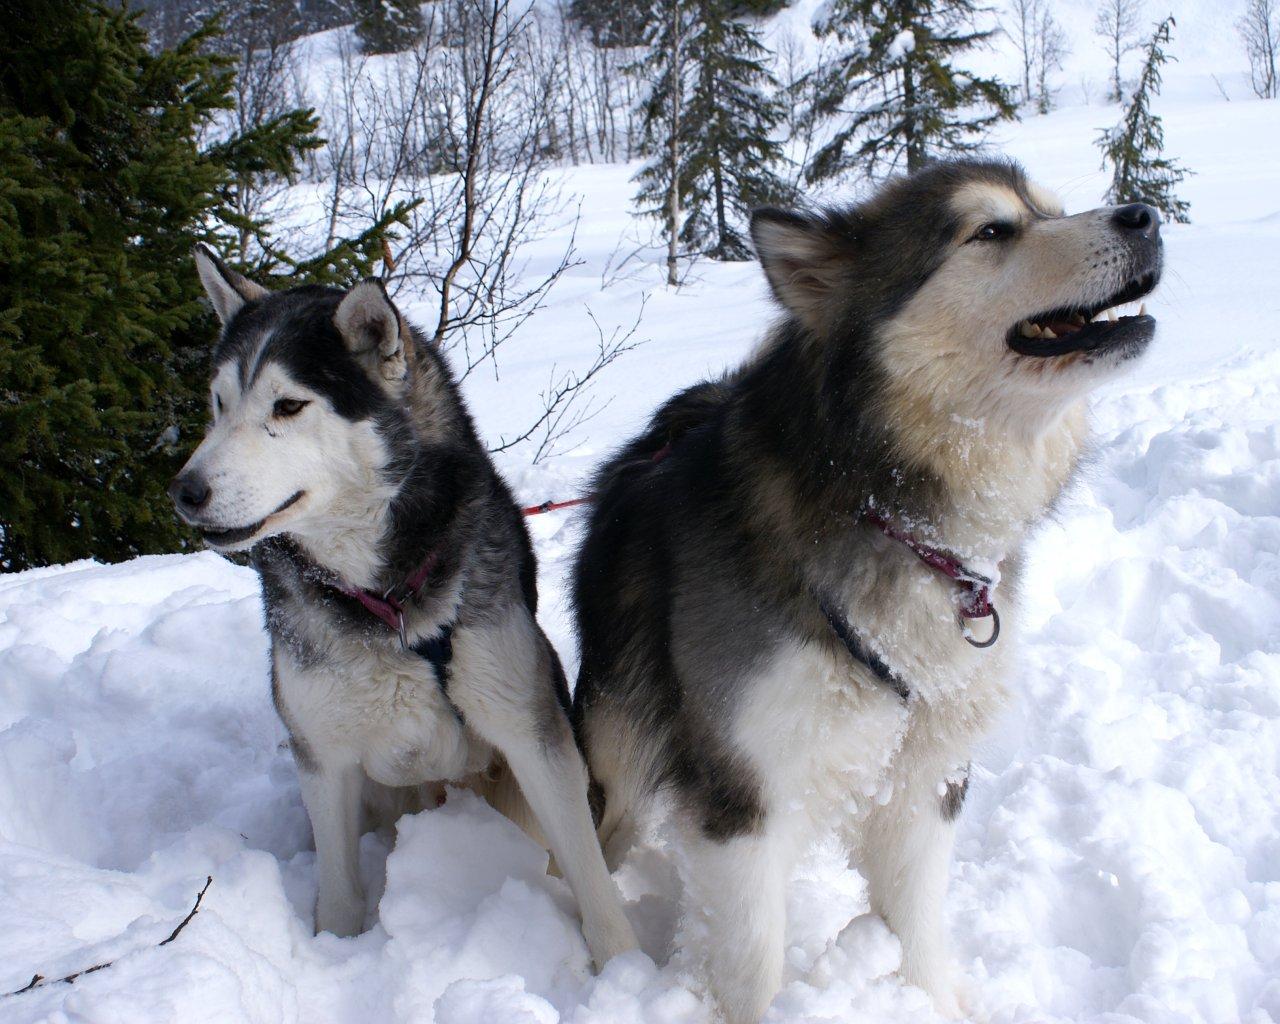 http://3.bp.blogspot.com/-IWw0rx48T8w/UEkAhlsZbwI/AAAAAAAAAOU/Hx_bzIJwnIE/s1600/siberian-husky-dog-11.jpg